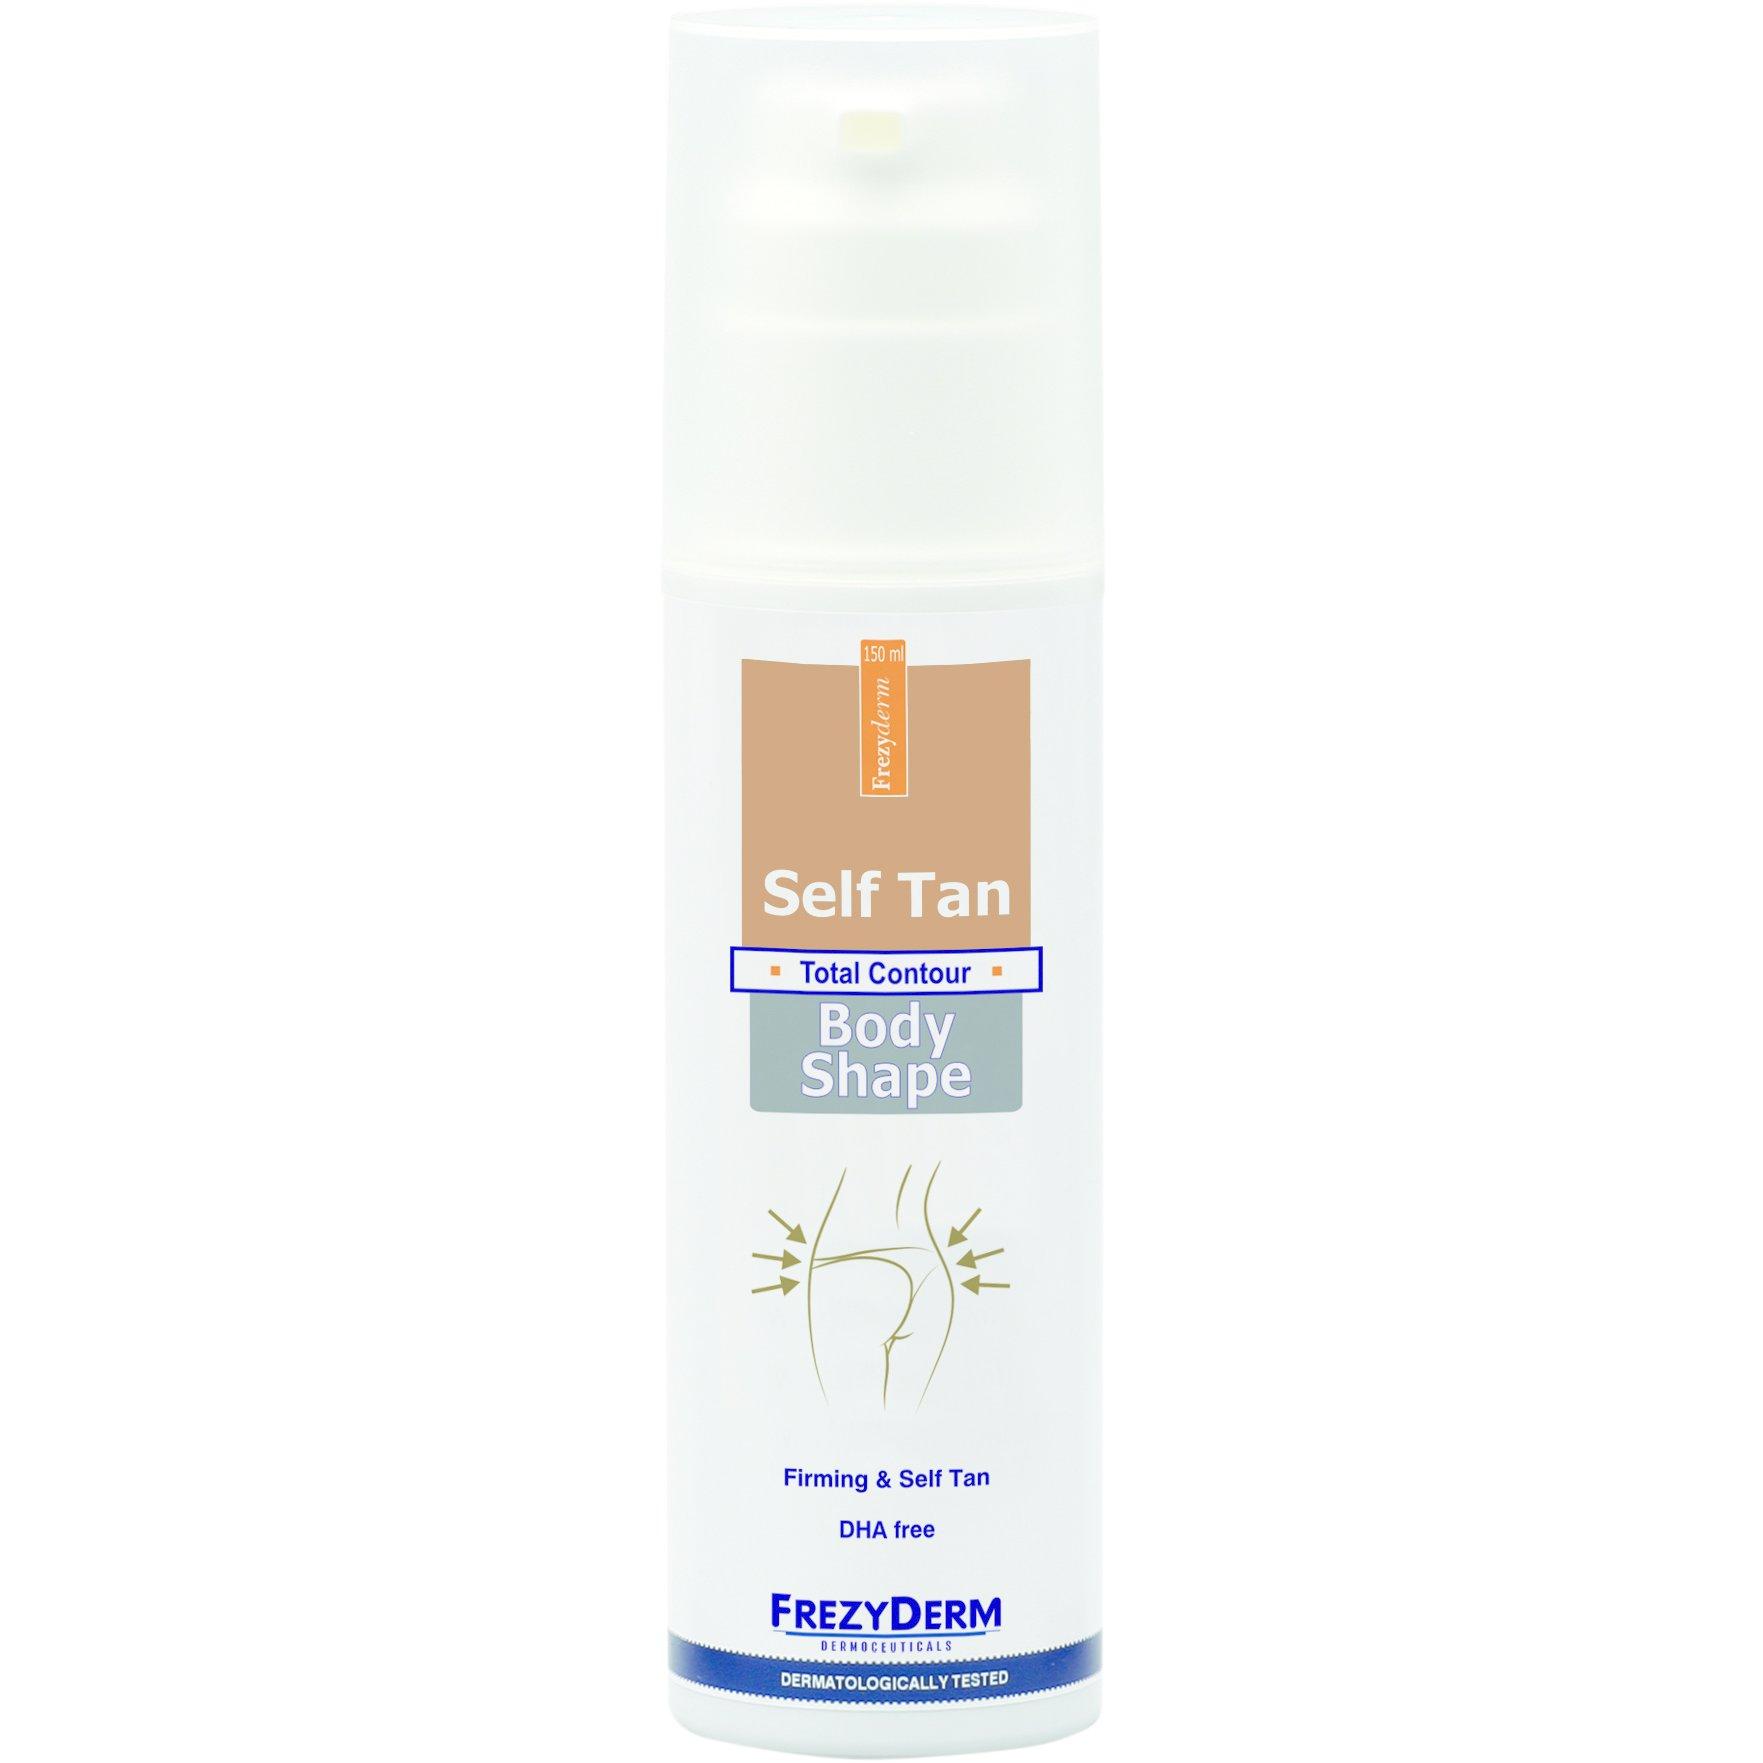 Frezyderm Self Tan Body Shape Αυτομαυριστικό Γαλάκτωμα με Παράλληλη Συσφικτική Δράση 150ml